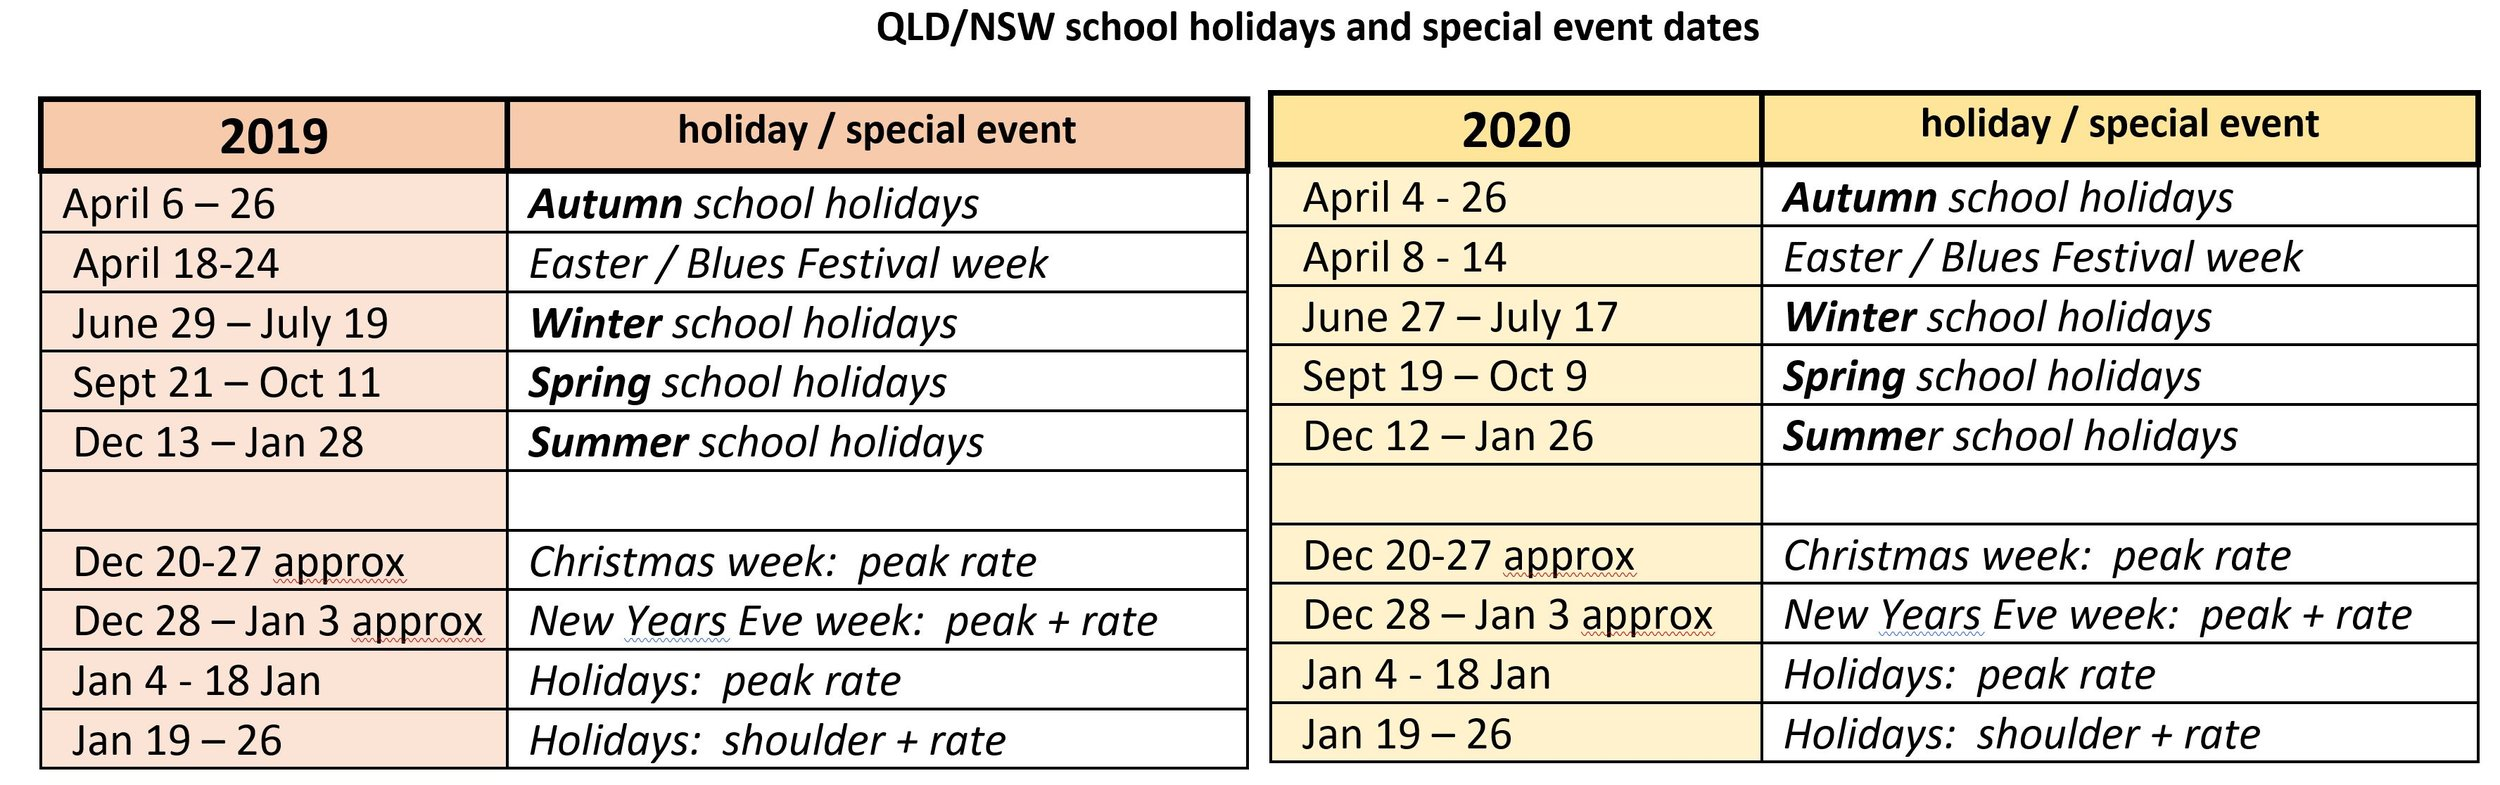 School holidays 2019-2020.JPG